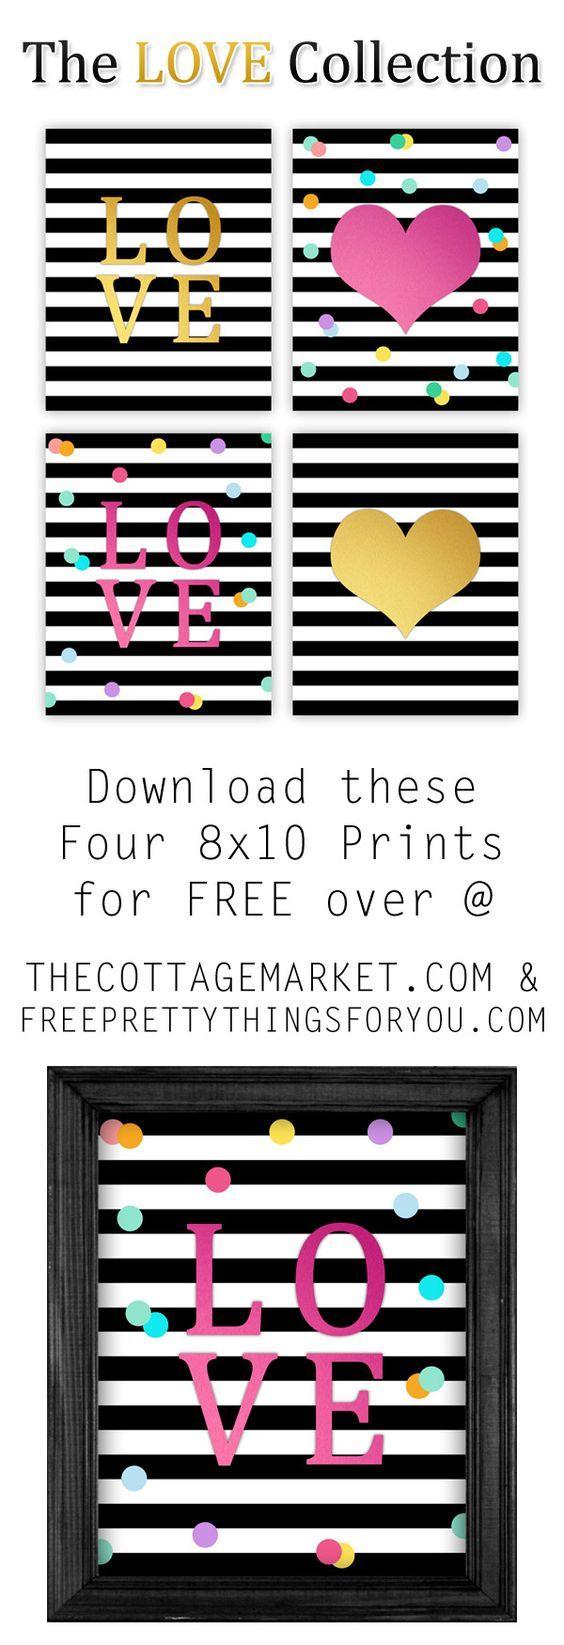 Art Prints: 8x10 Love Printables Part 2 - Free Pretty Things For You